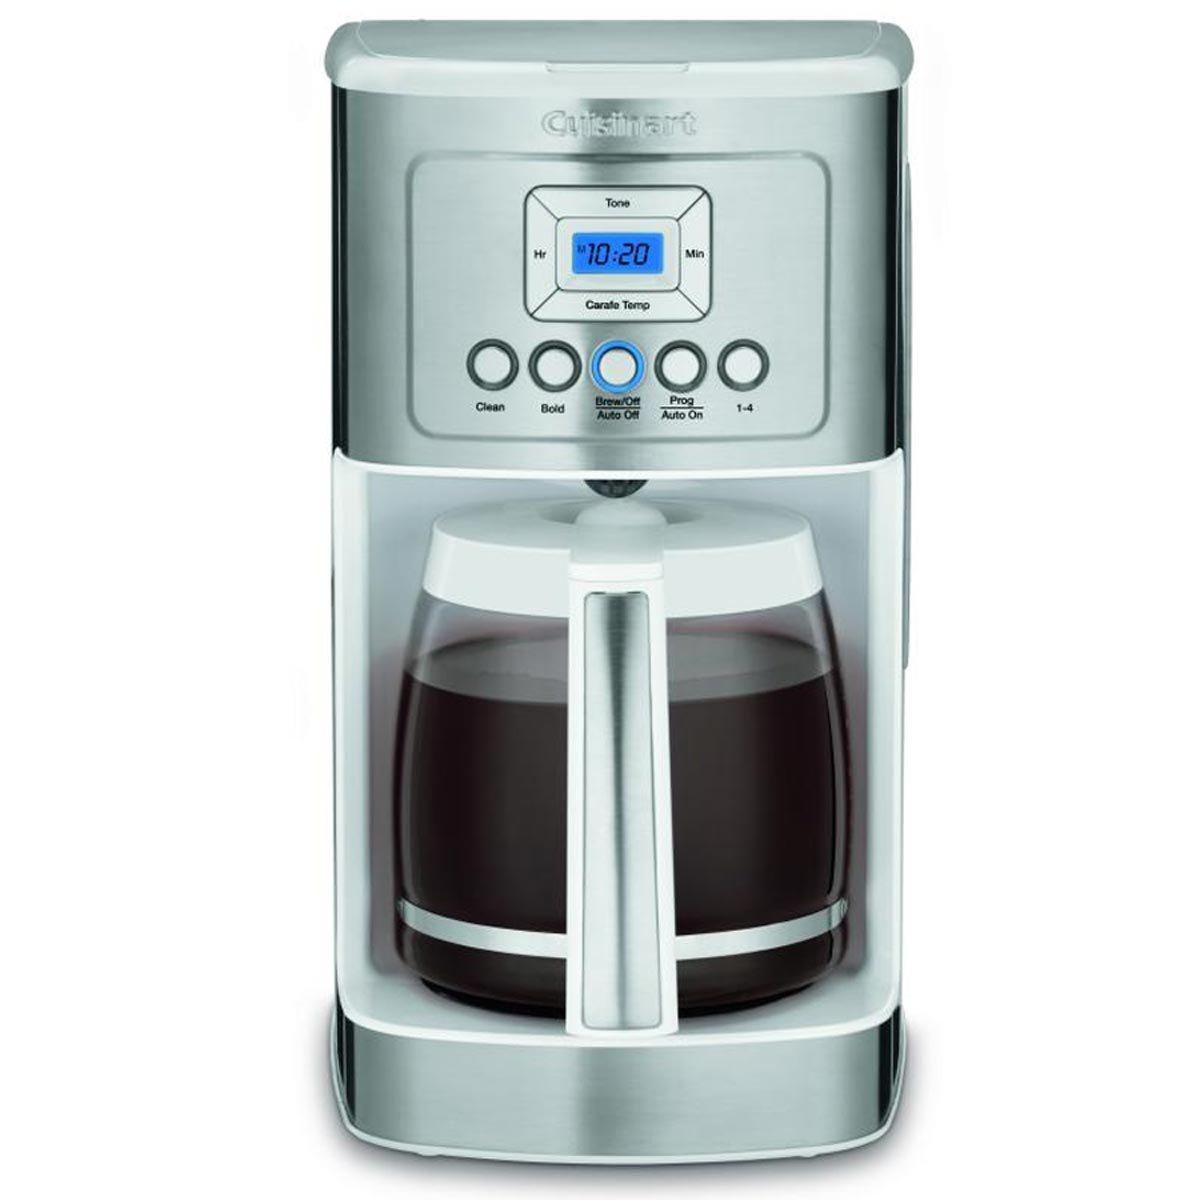 Amazon.com: Cuisinart DCC-3200W Perfect Temp 14-Cup Programmable ...